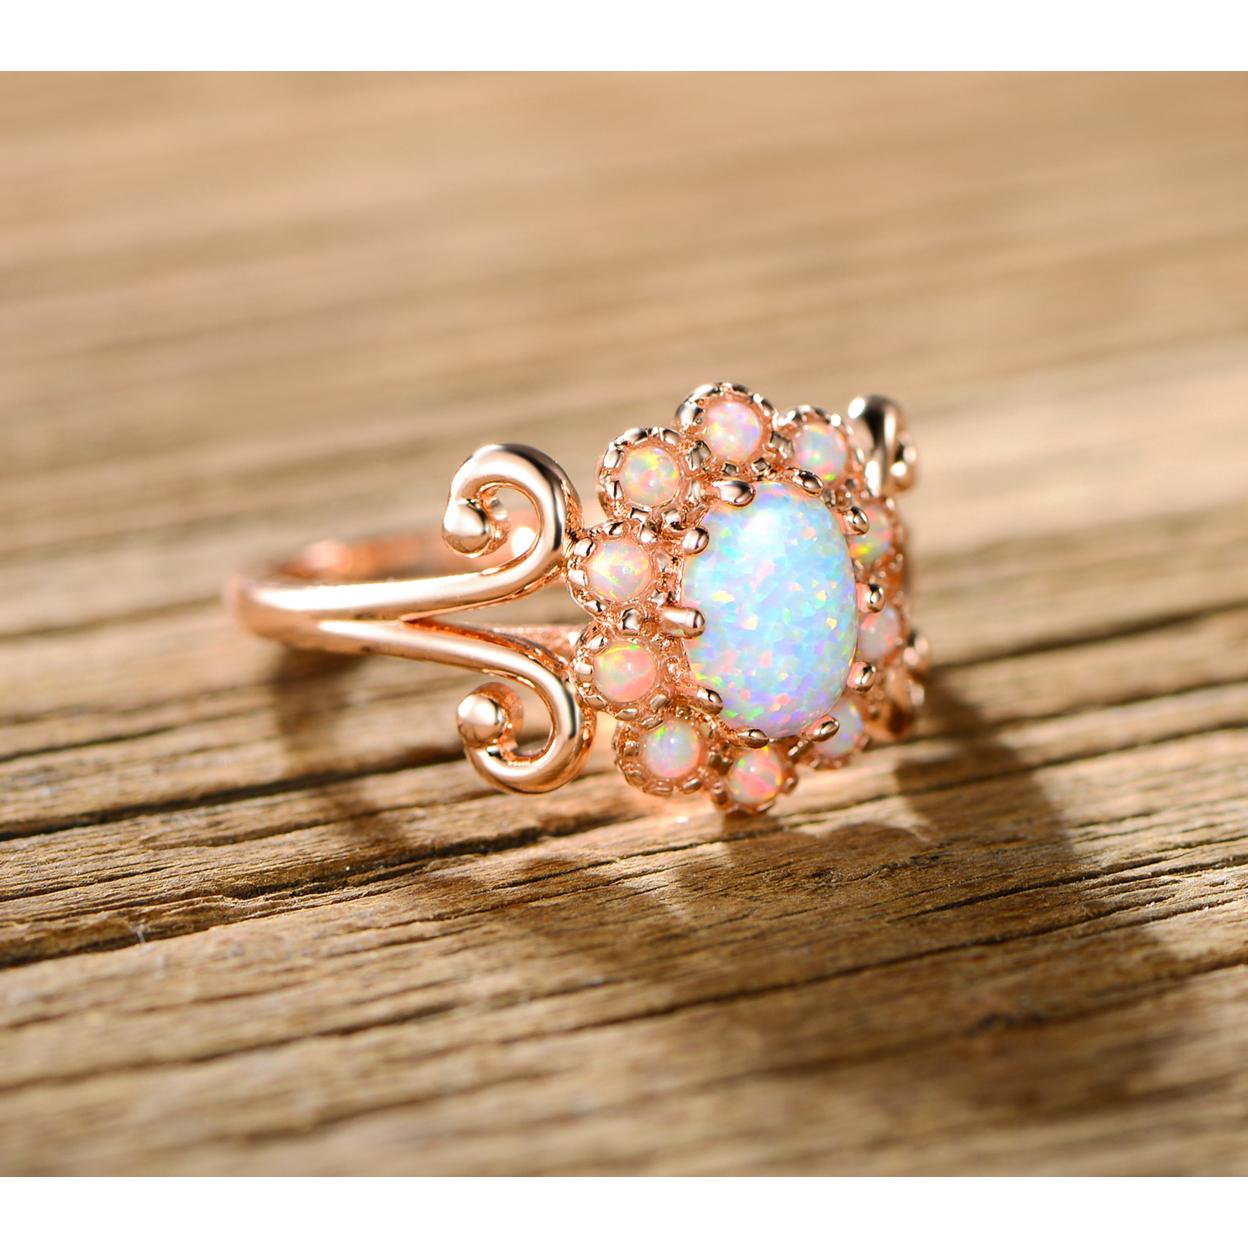 Blue Jelly Opal Filigree Cocktail Ring - Size 5 59e904bc6d88eb32fb23da23